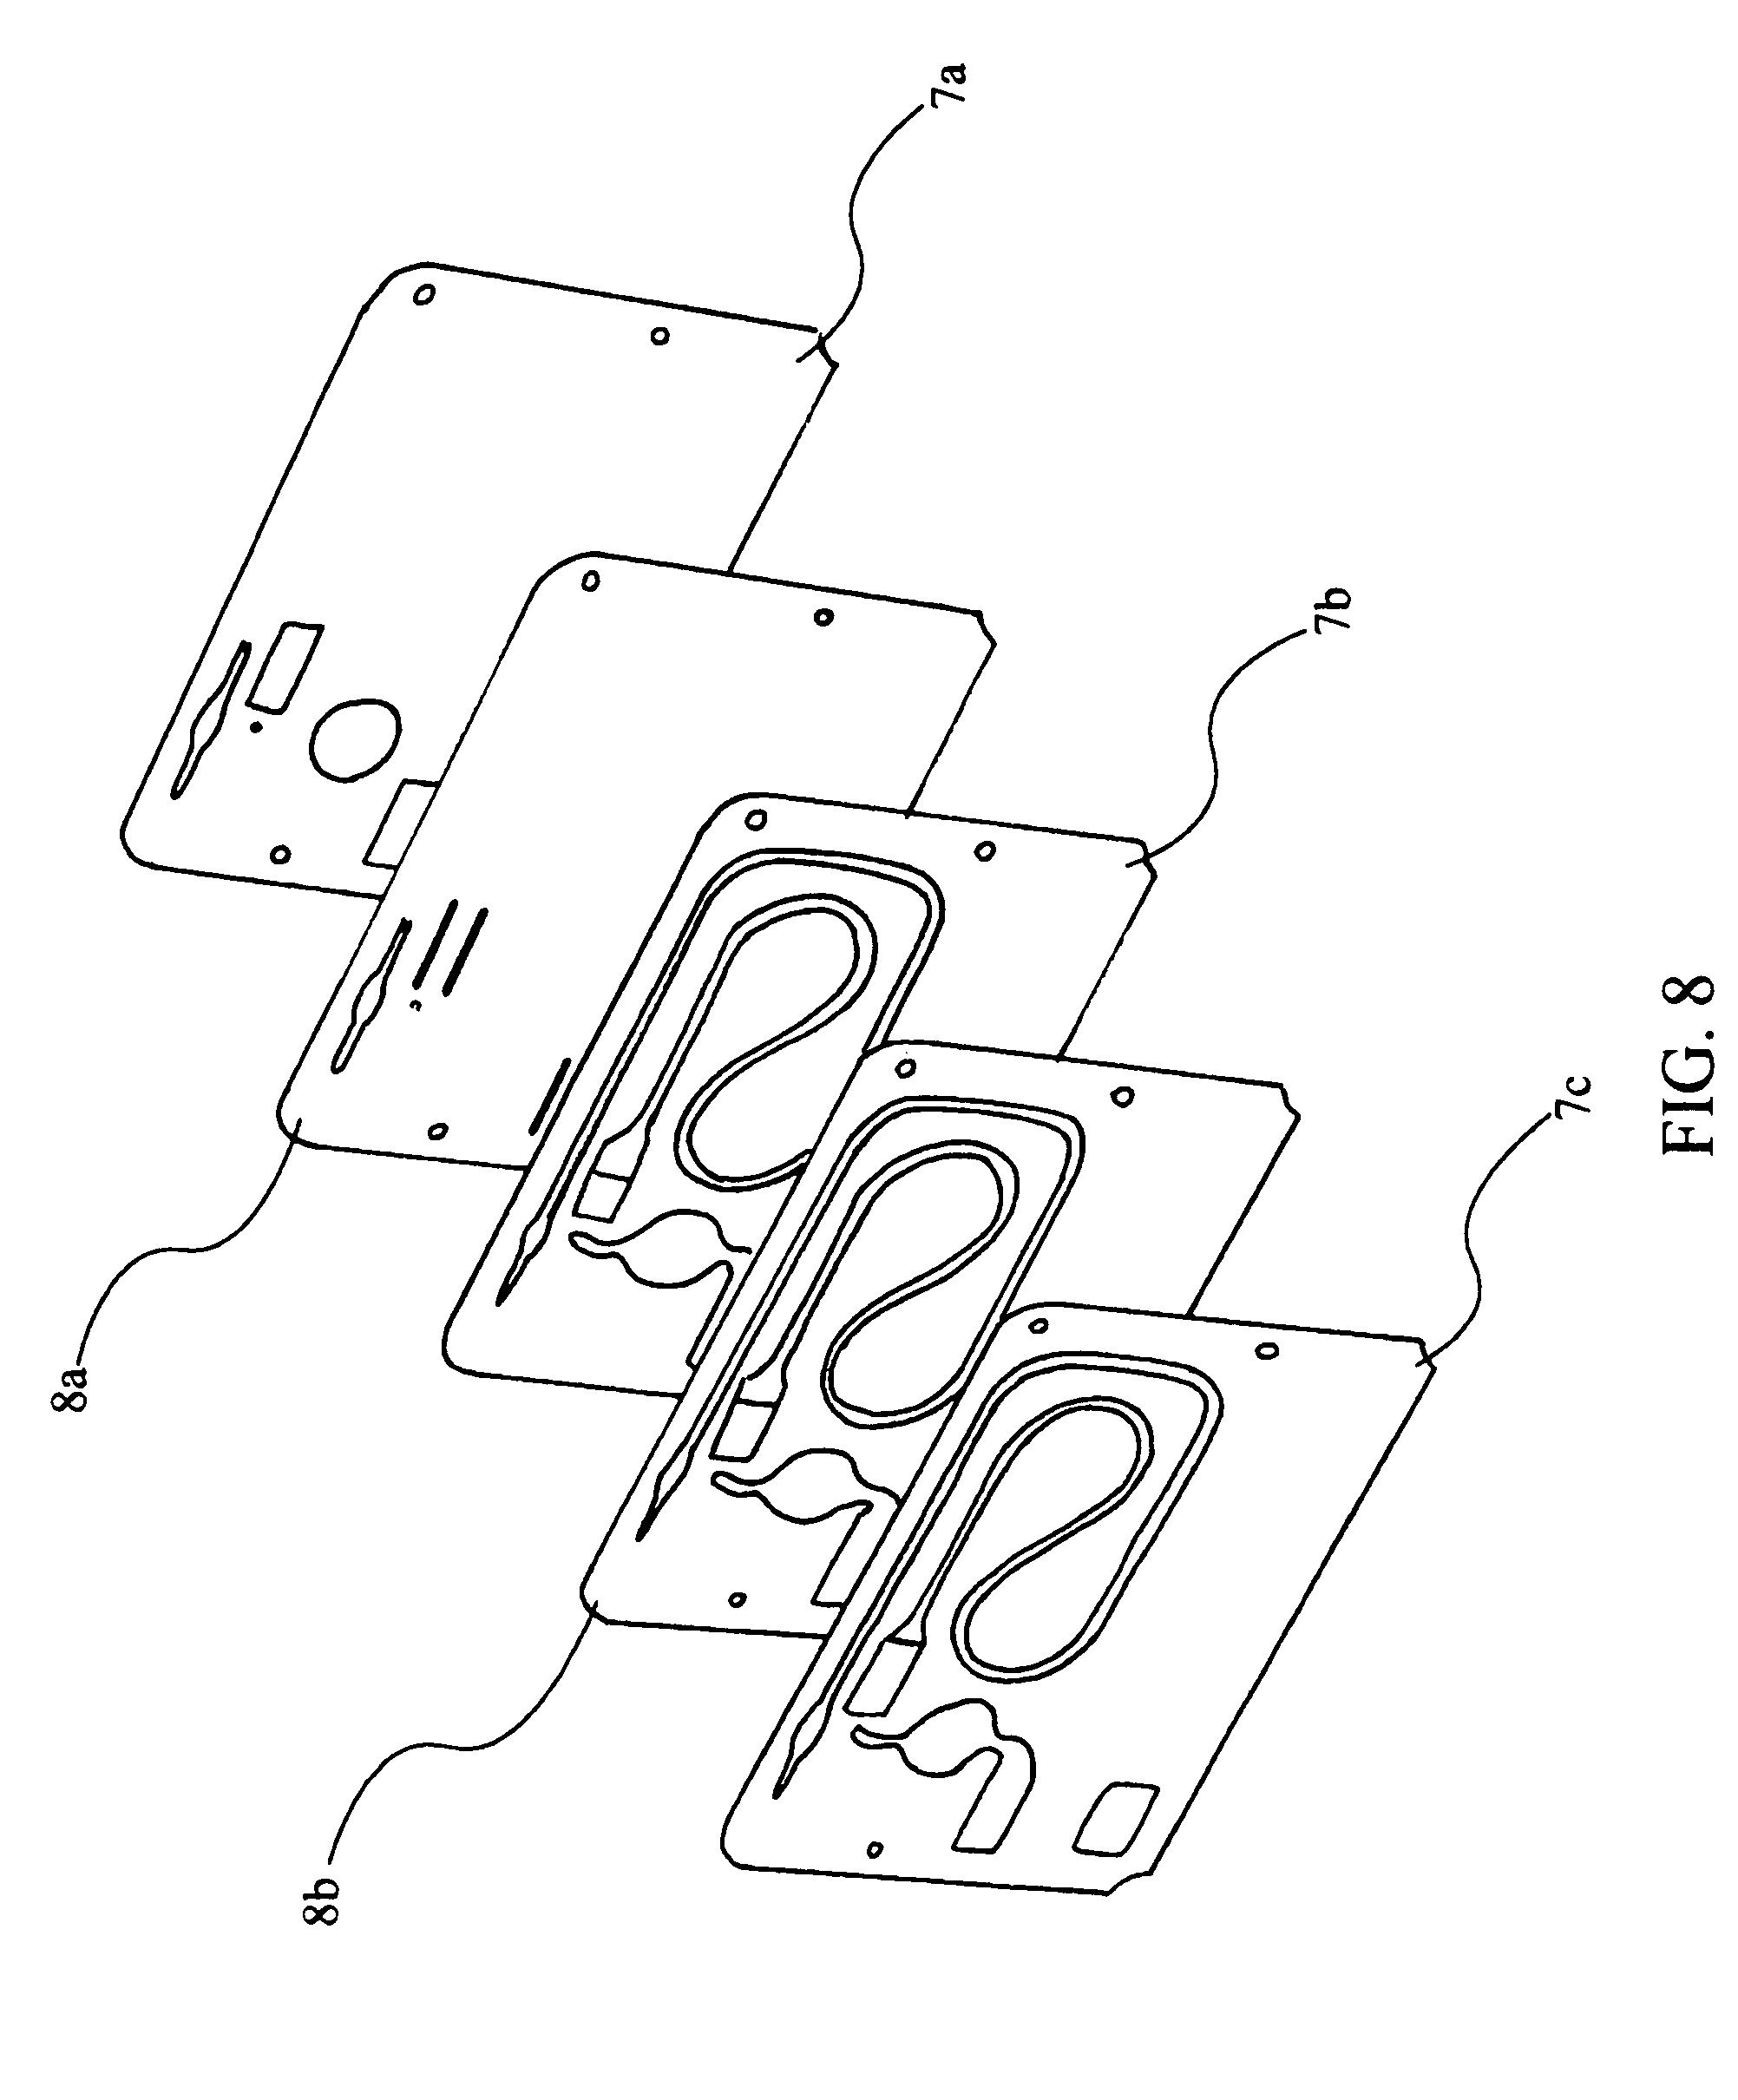 halogen headlight wiring diagrams